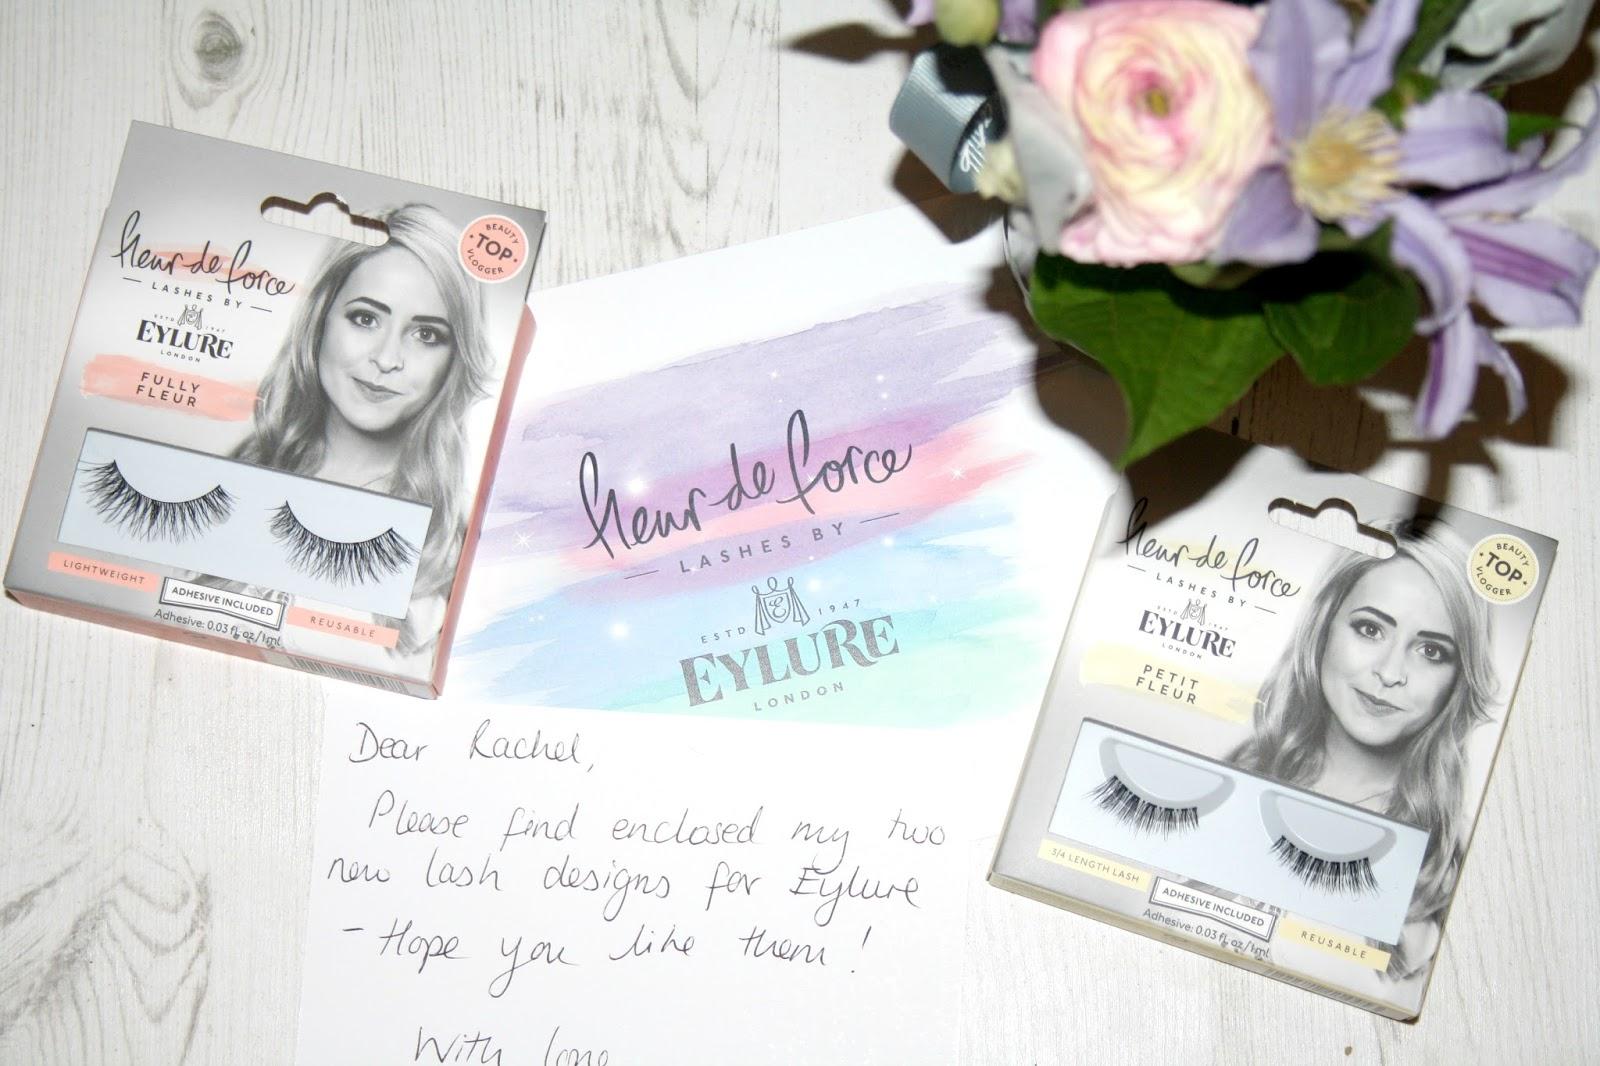 736cc2bbf4f Beautyqueenuk | A UK Beauty and Lifestyle Blog: Fleur de Force ...